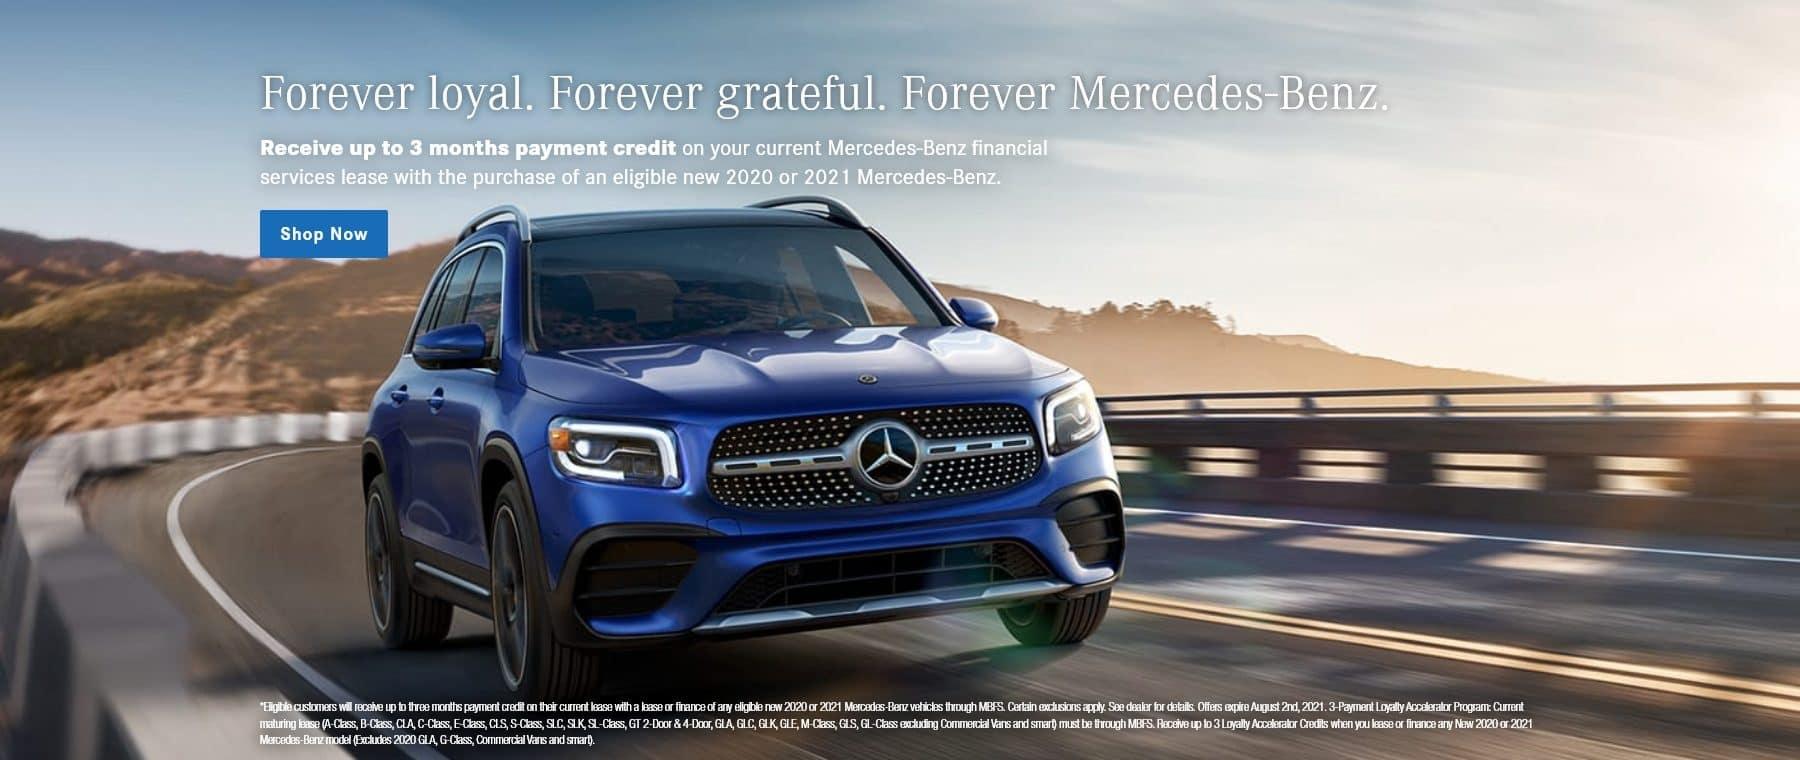 Forever Mercedes-Benz